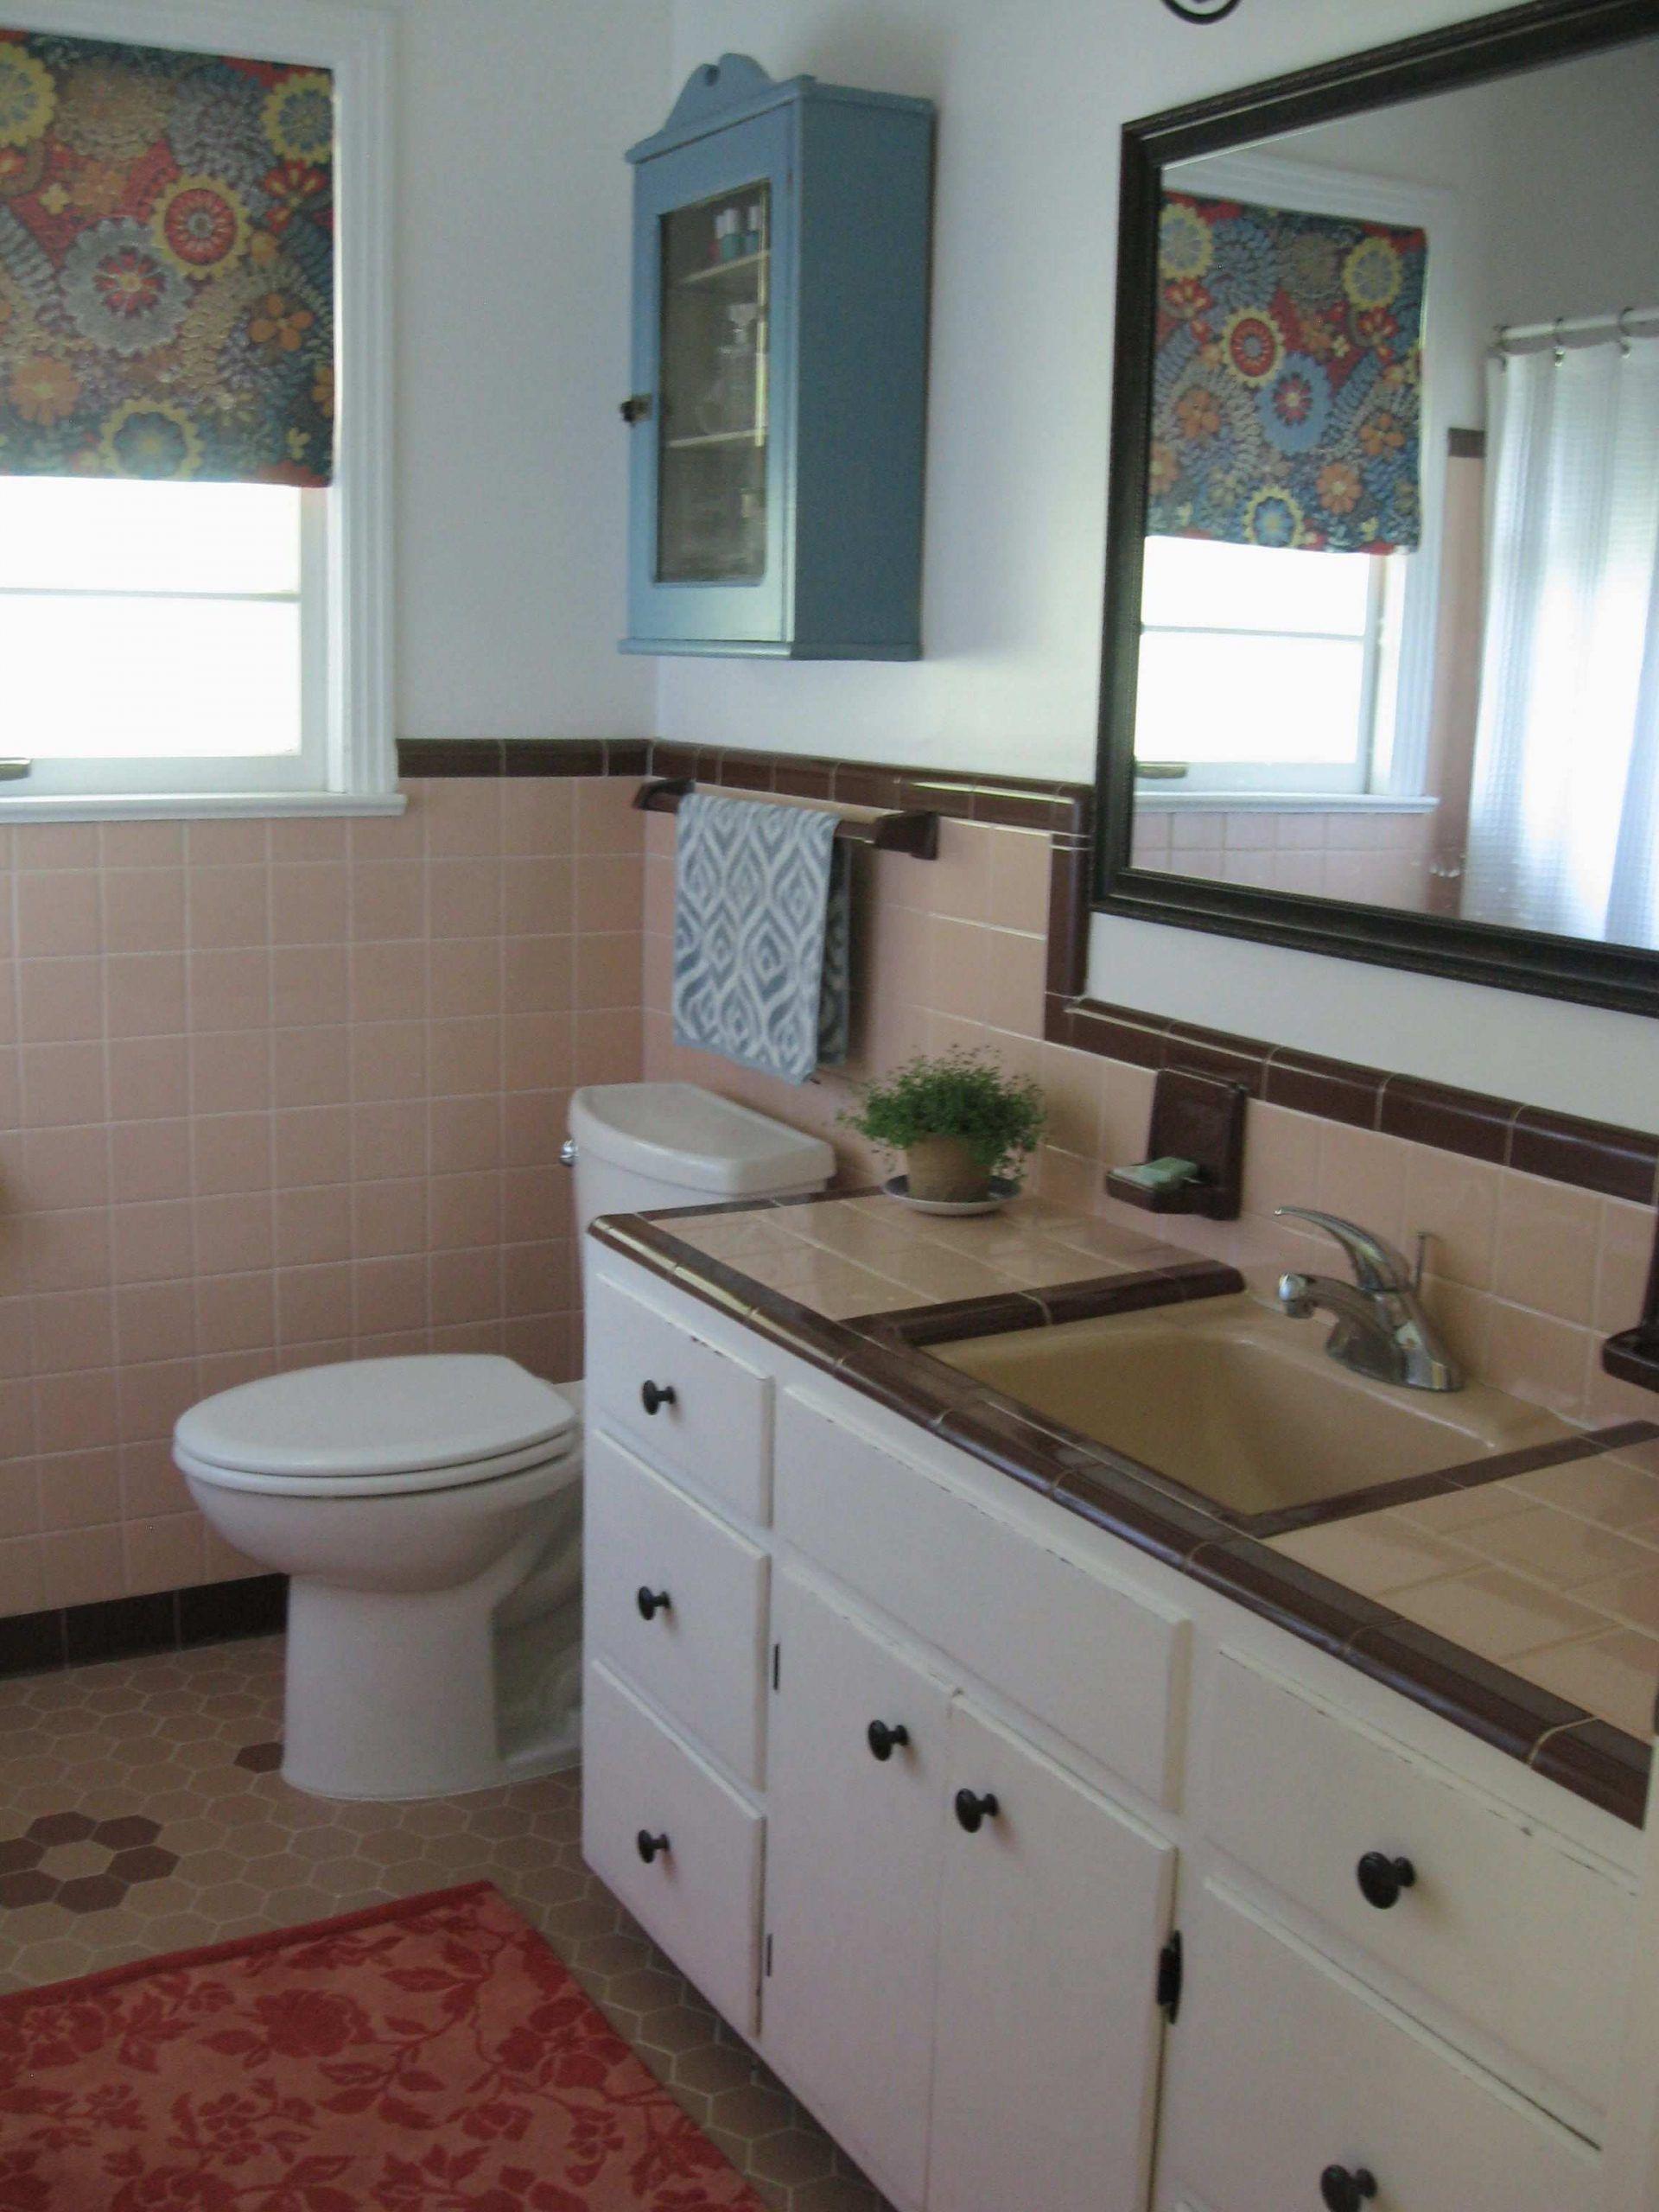 Retro Bathrooms Vintage Bathroom Tile, What Colours Go With Peach Bathroom Tiles